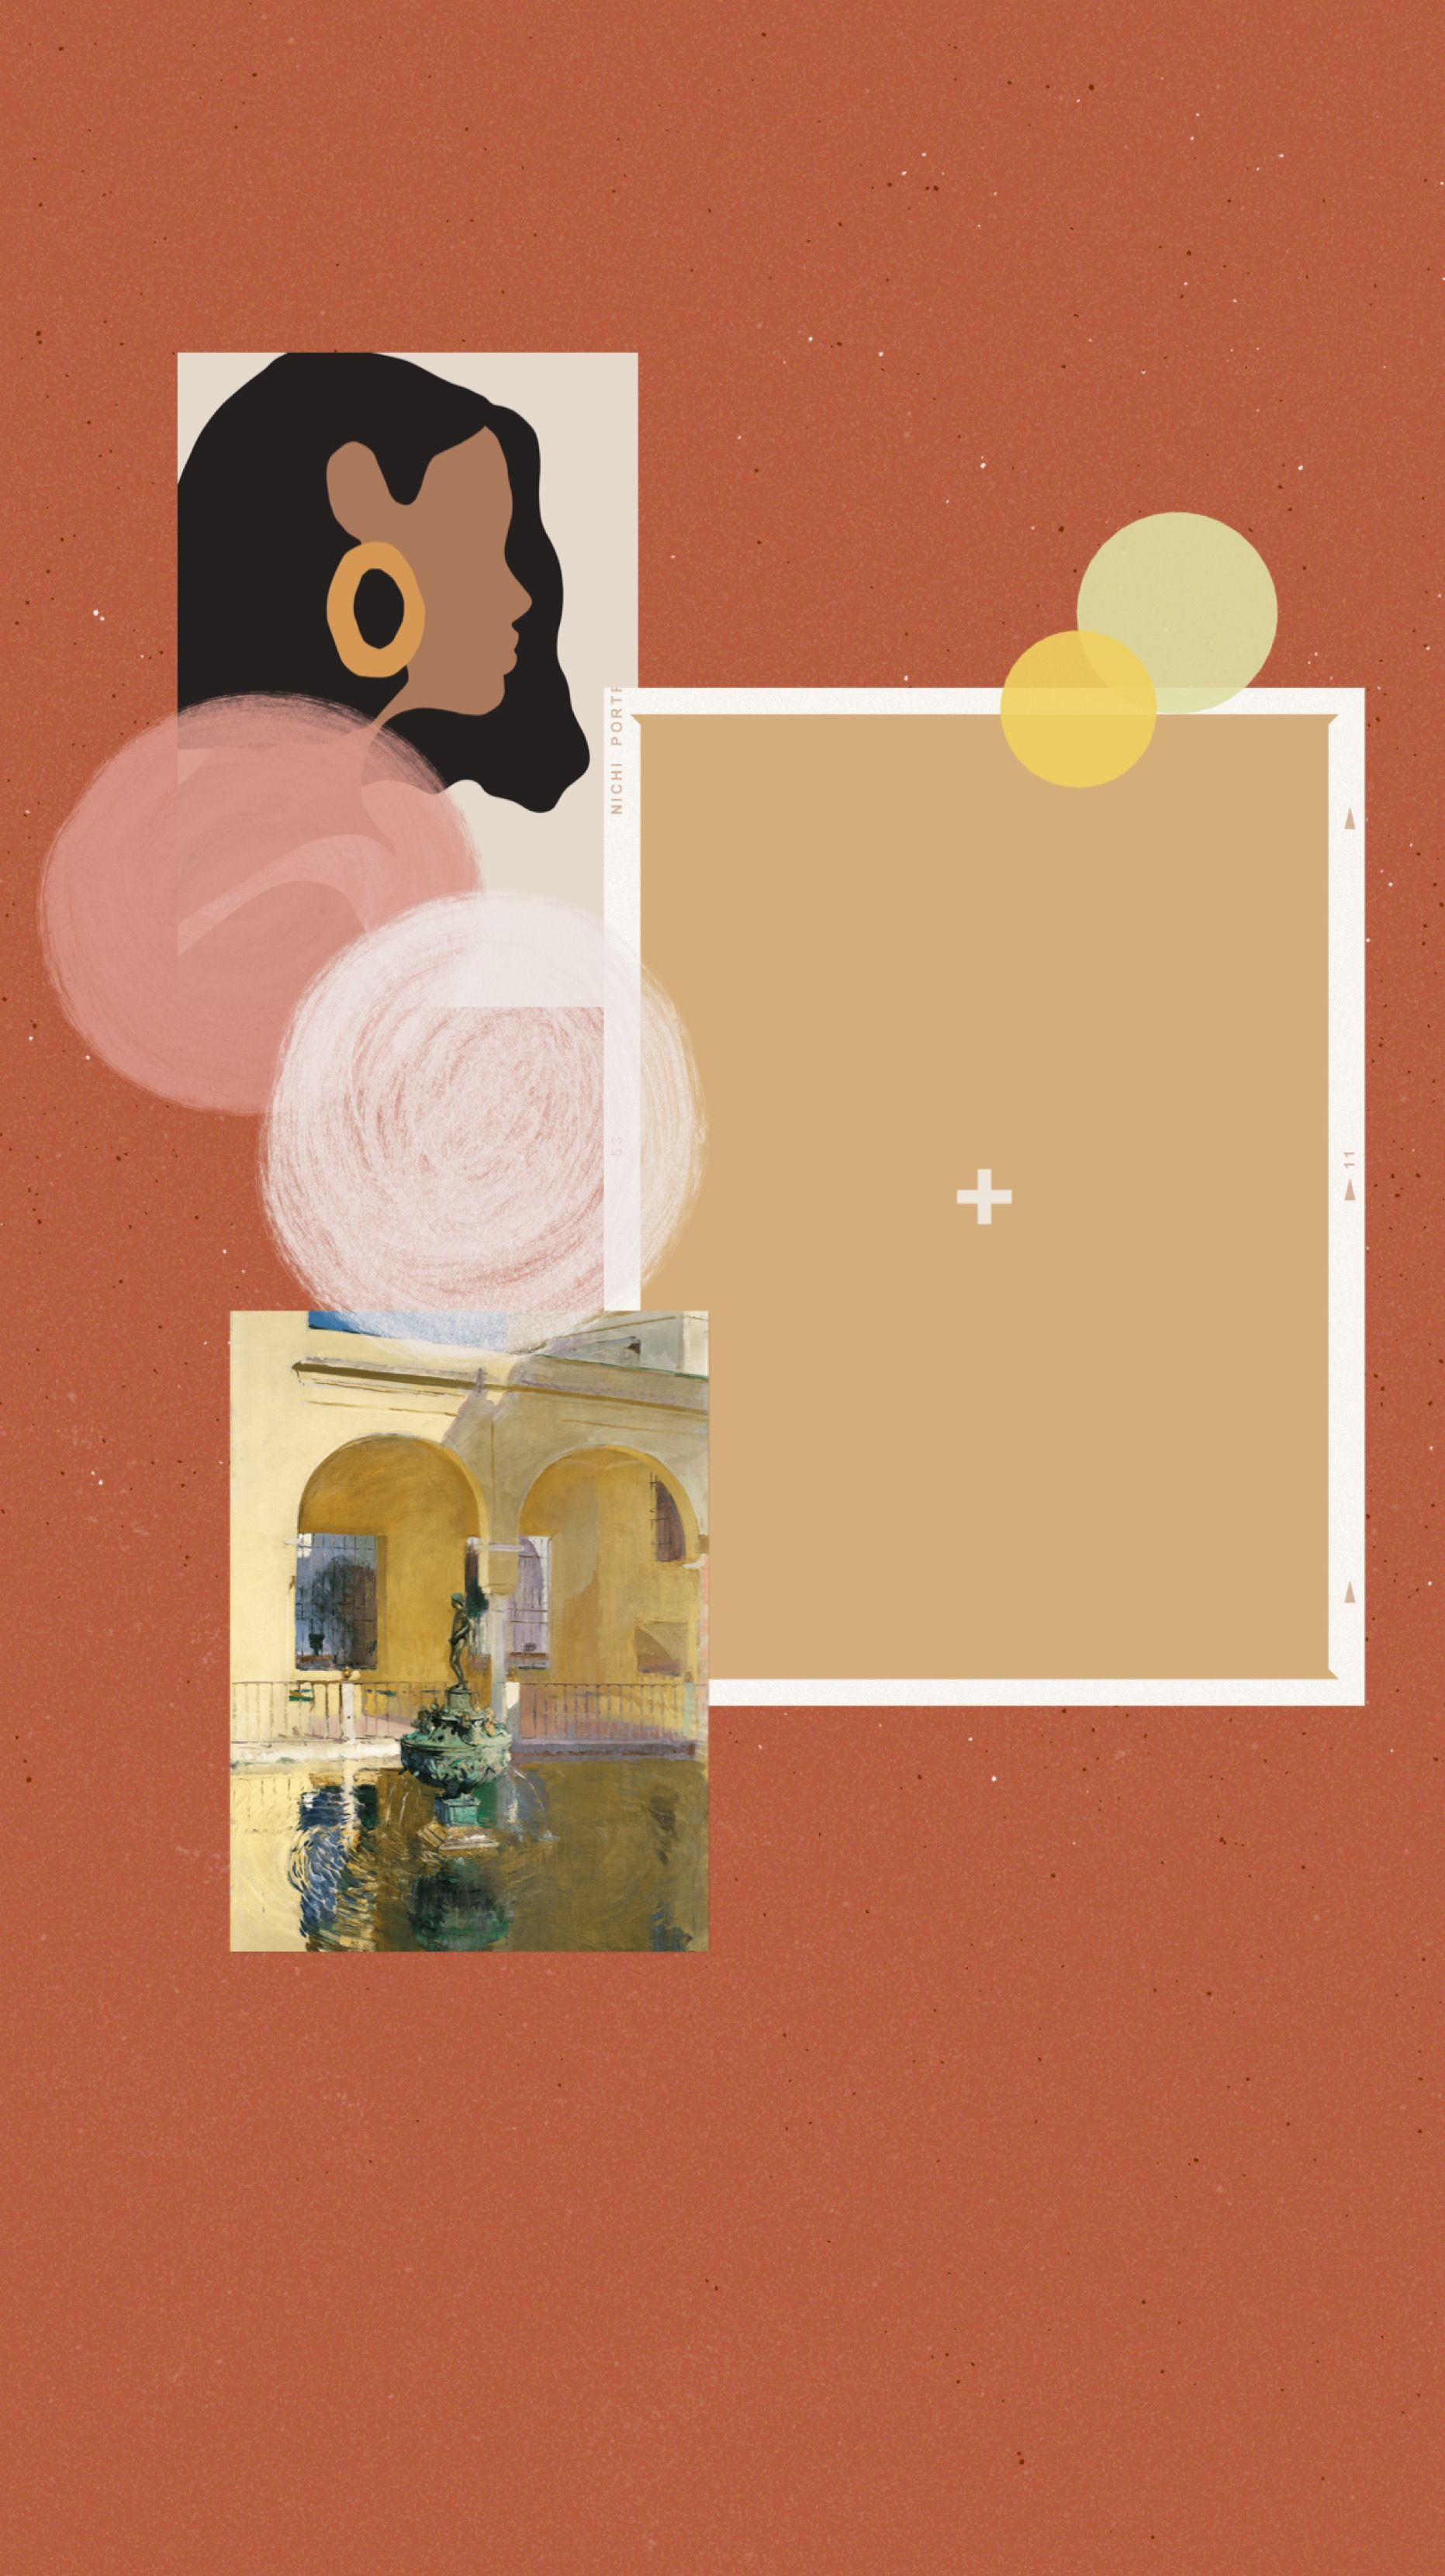 Nichi app (Dengan gambar) Seni, Pengeditan foto, Bingkai